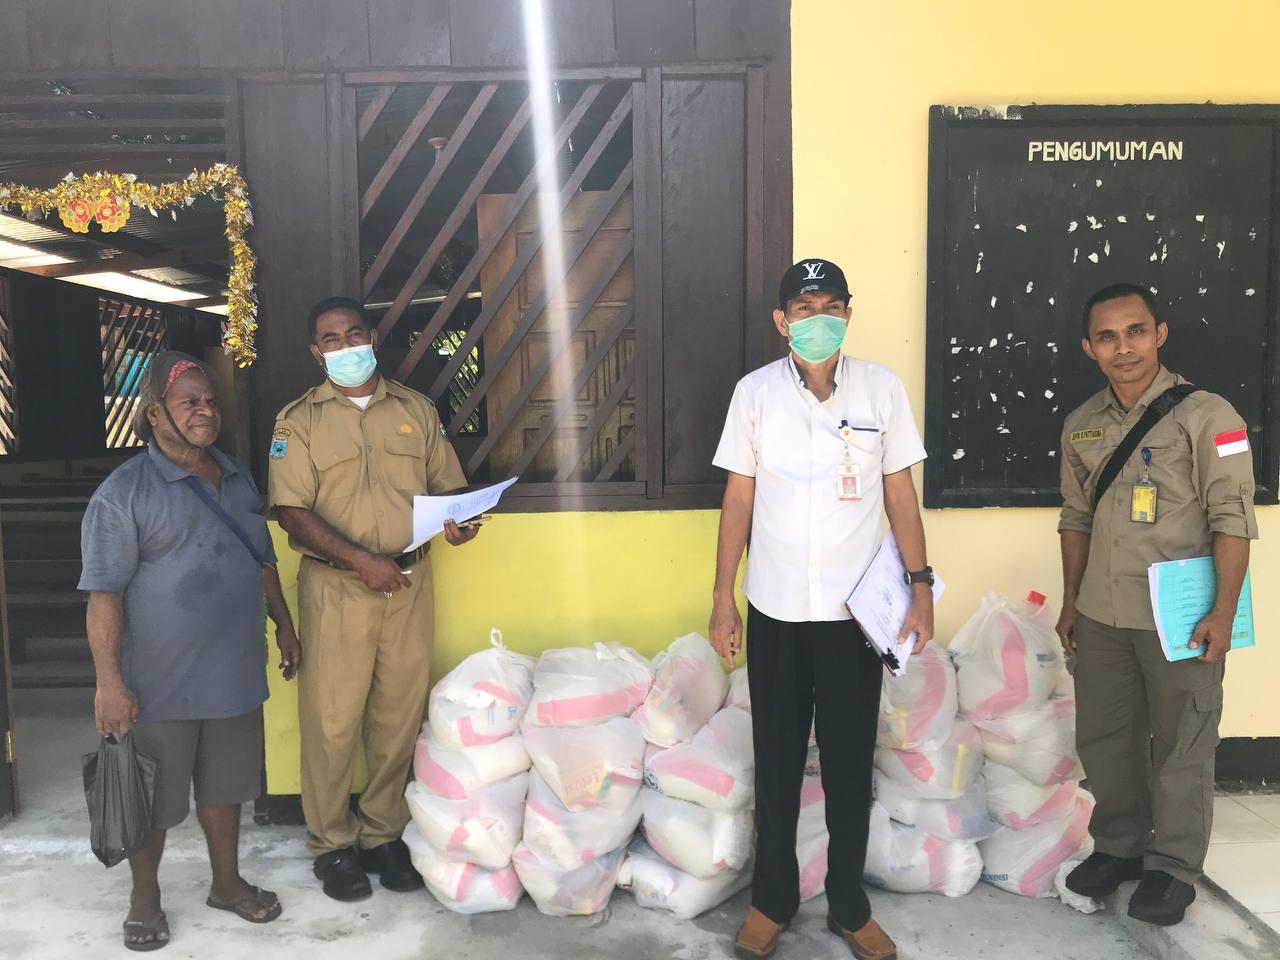 Foto Bersama Bendahara Stasi ST. Auxillius Ransiki, PD. Irian Bhakti dan Staf Balitbangda Papua Barat